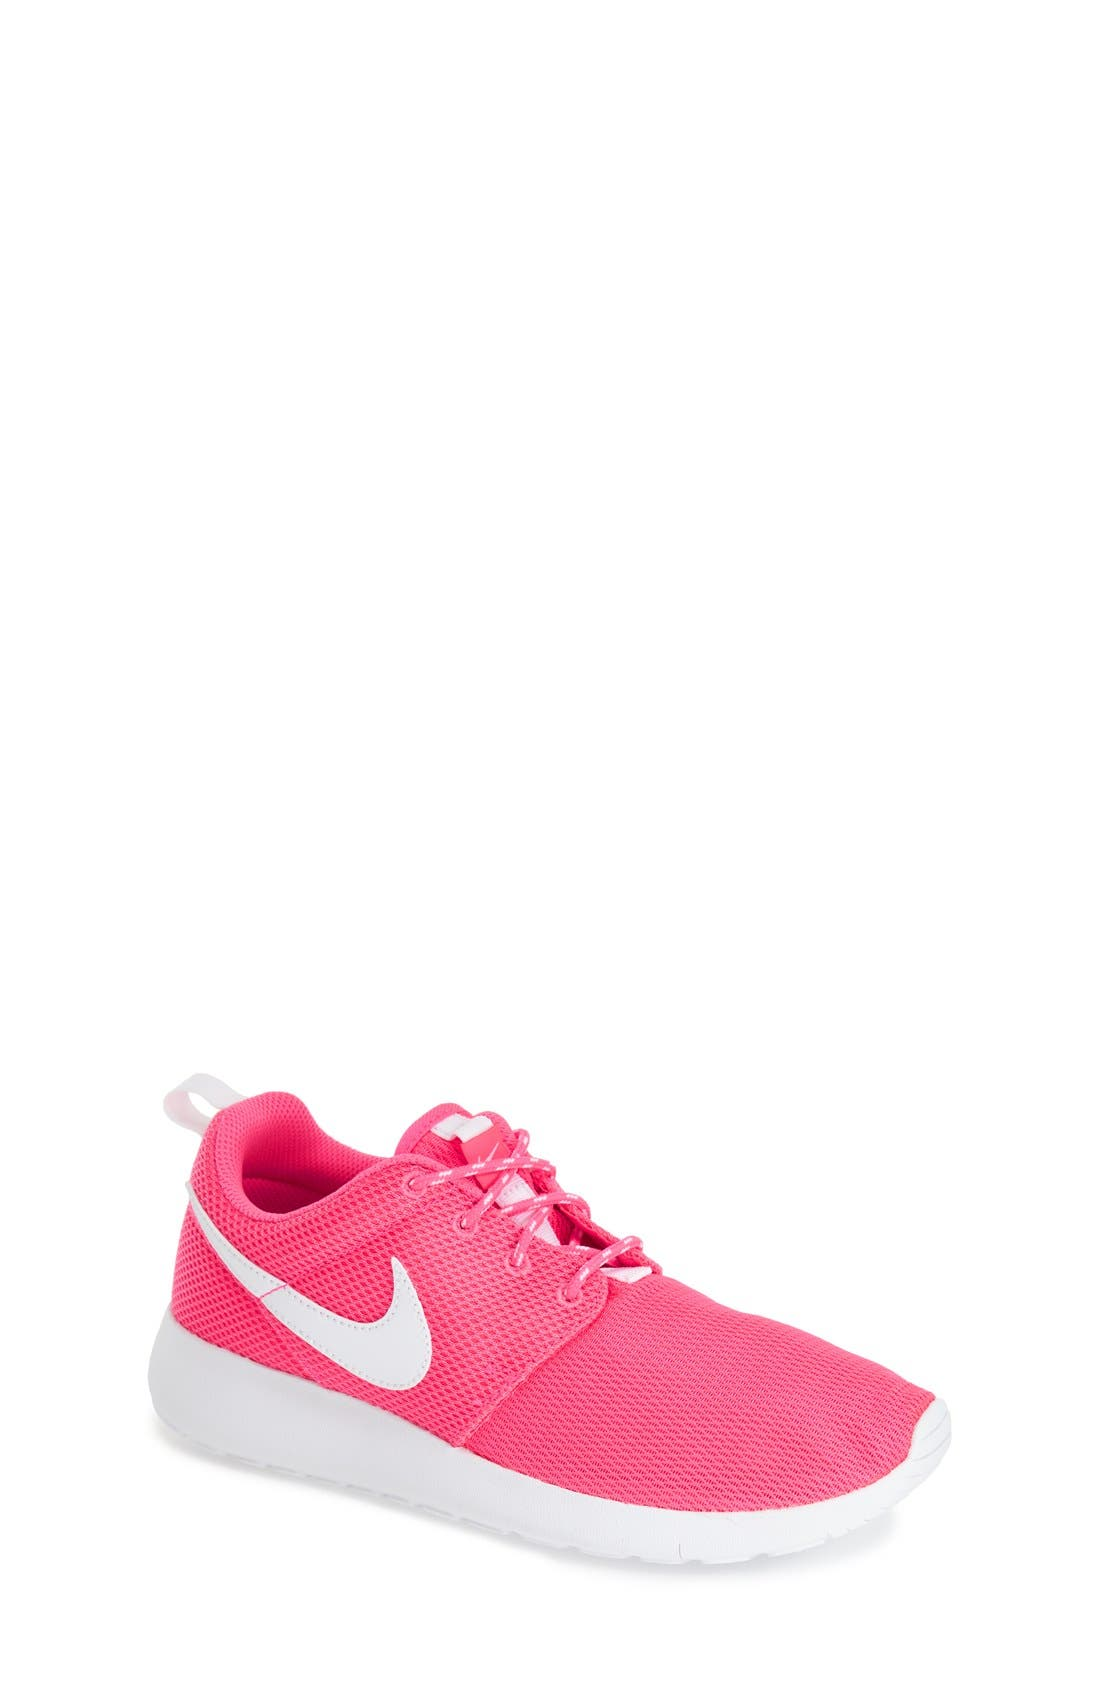 Main Image - Nike 'Roshe Run' Athletic Shoe (Little Kid & Big Kid)